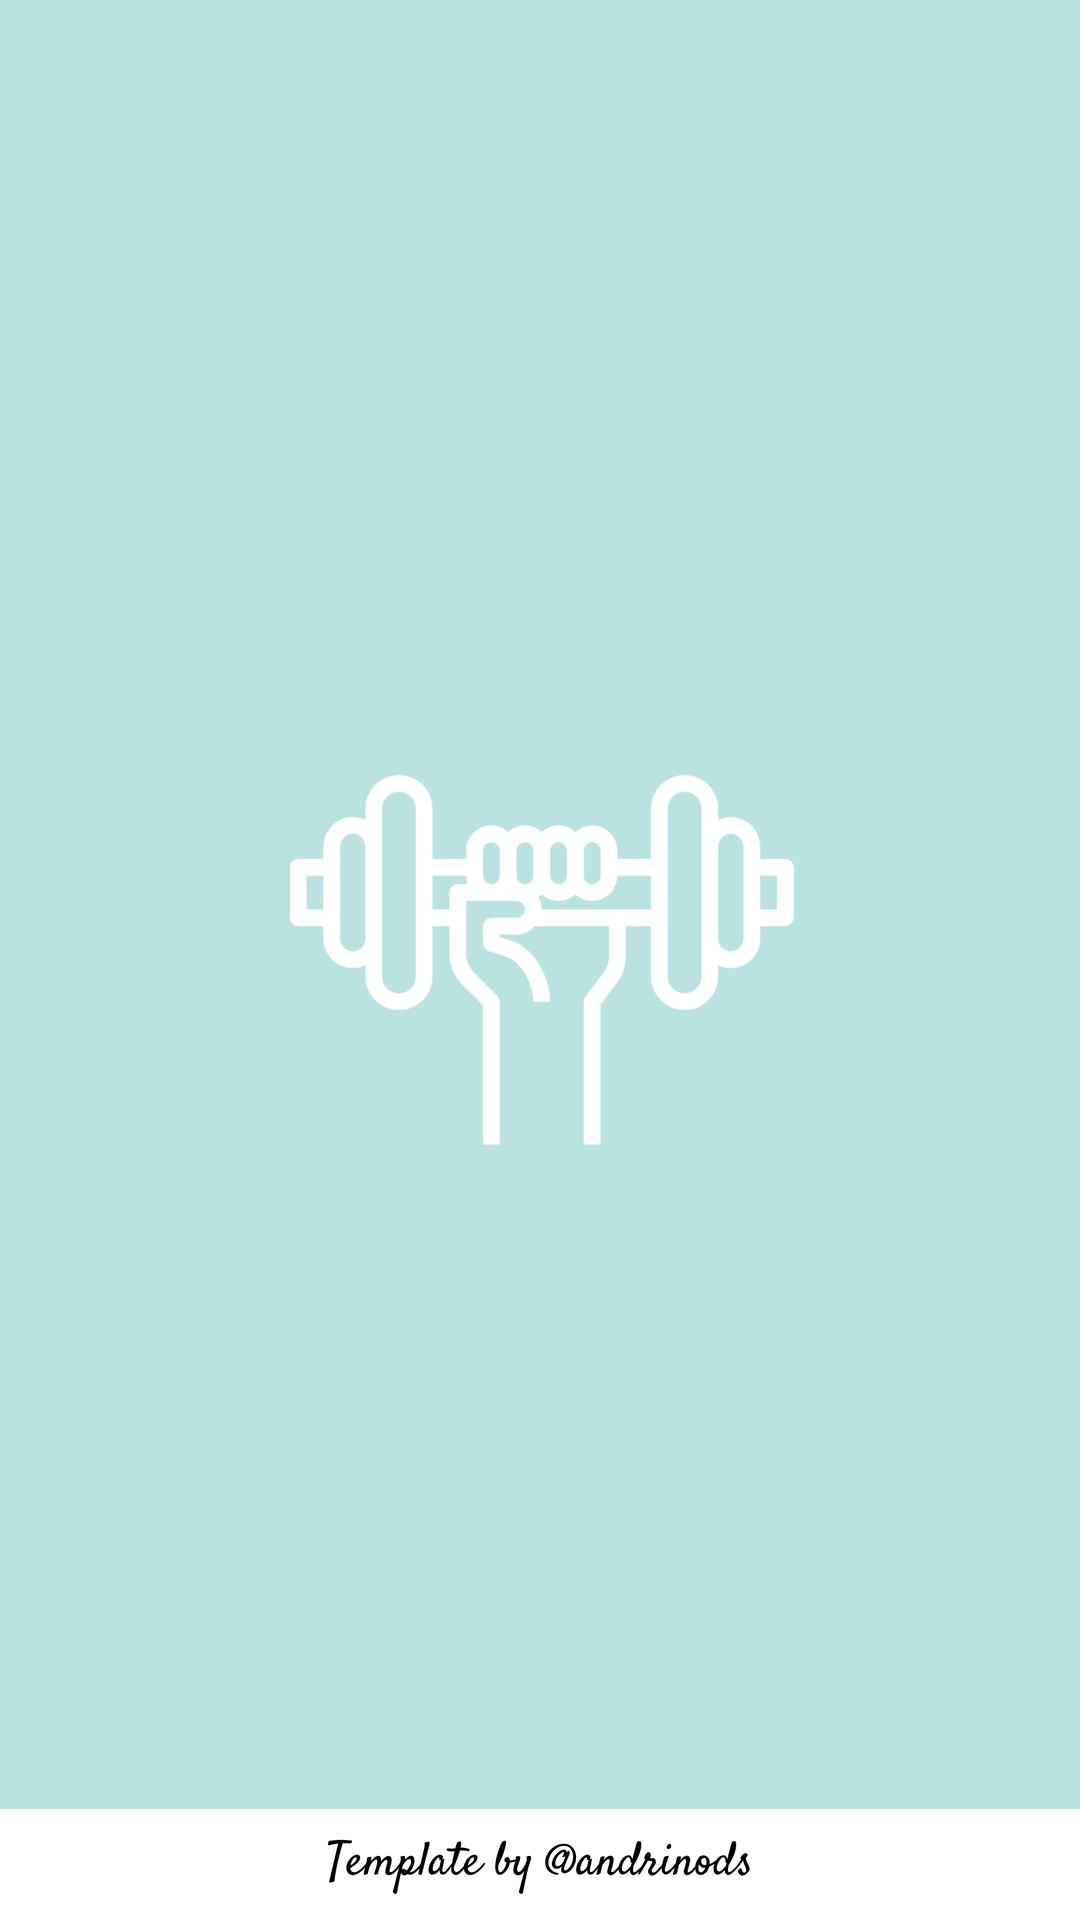 Gym Fitness Instagram Icons Instagram Highlight Icons Instagram Blog